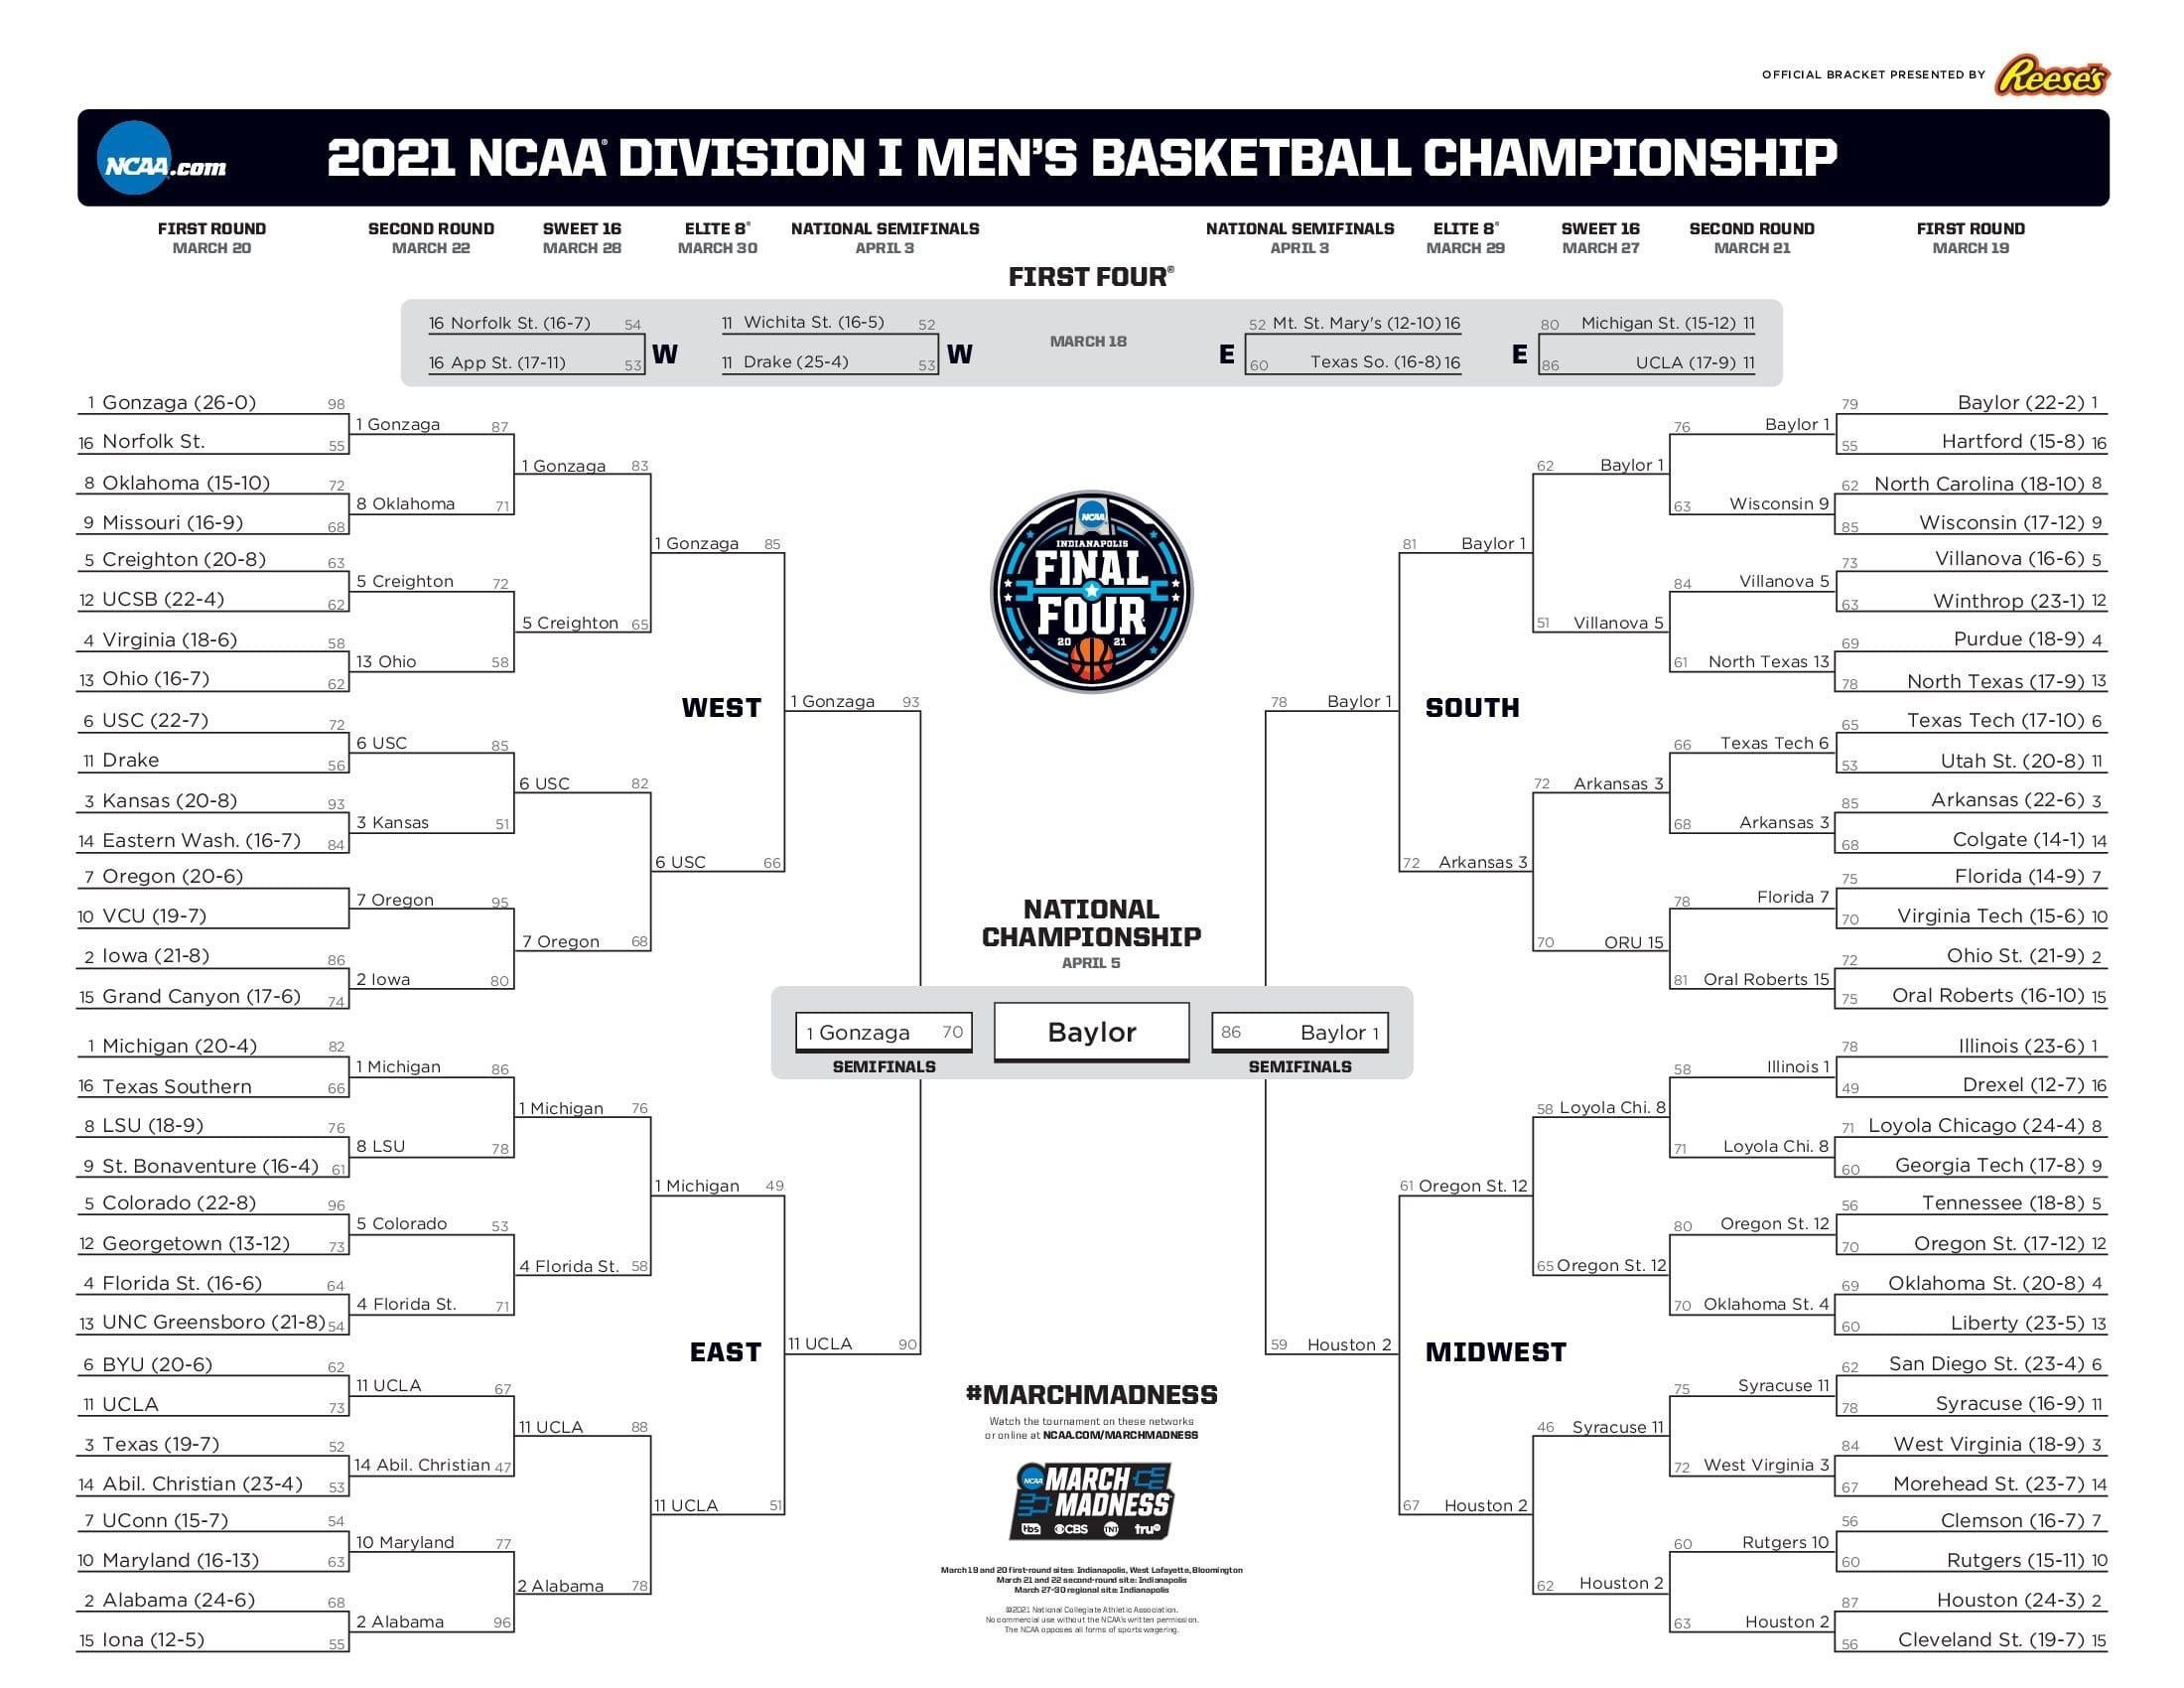 2021 NCAA bracket: Printable March Madness bracket .PDF